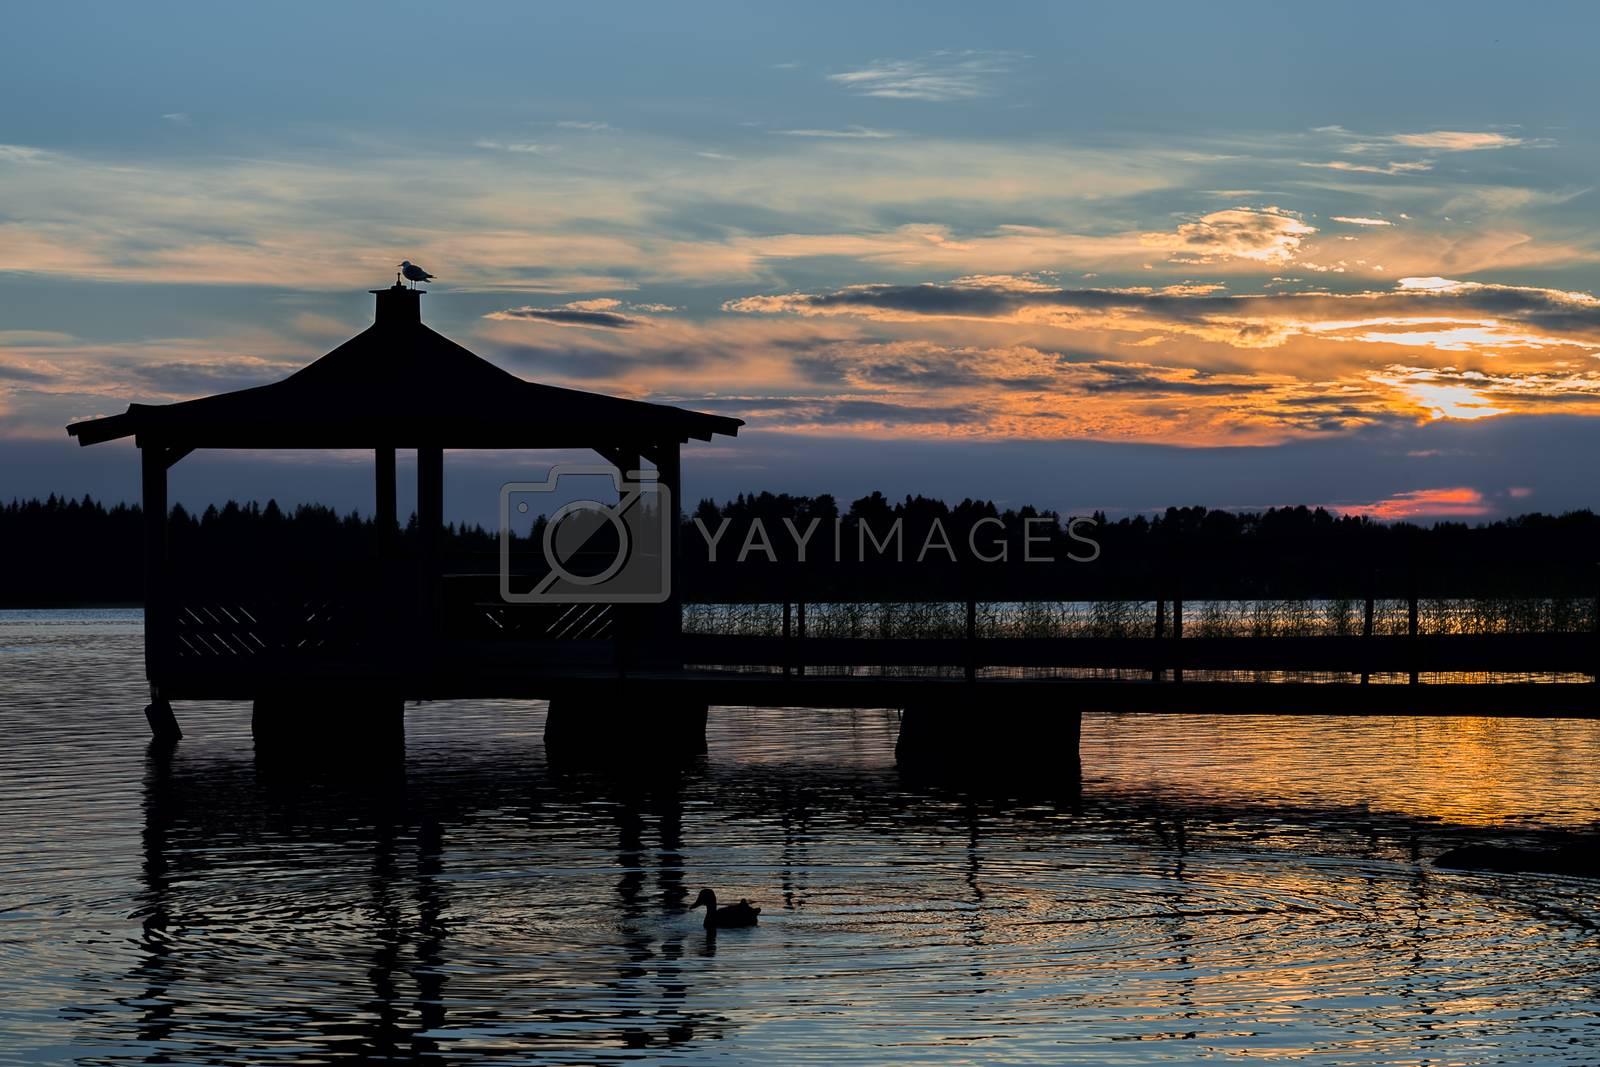 Gazebo in Lake with Mallard Duck in Water at Sunset.